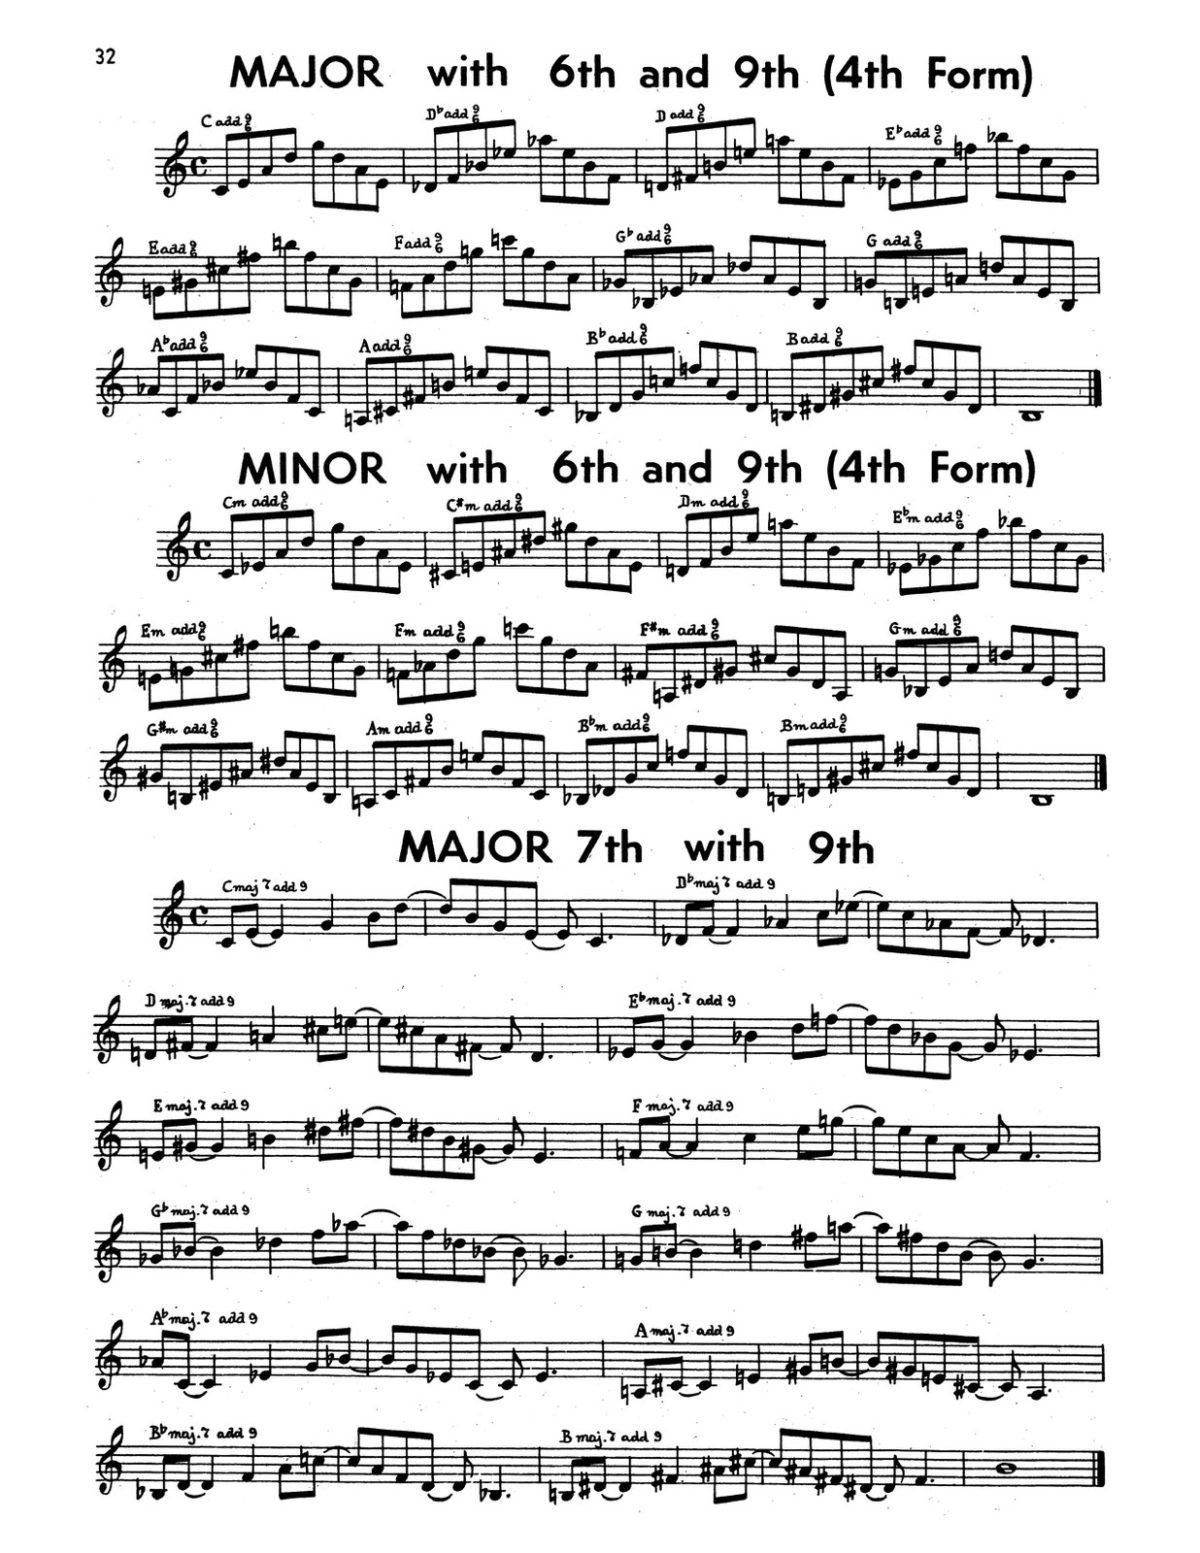 Gornston, All Chords for Trumpet-p34